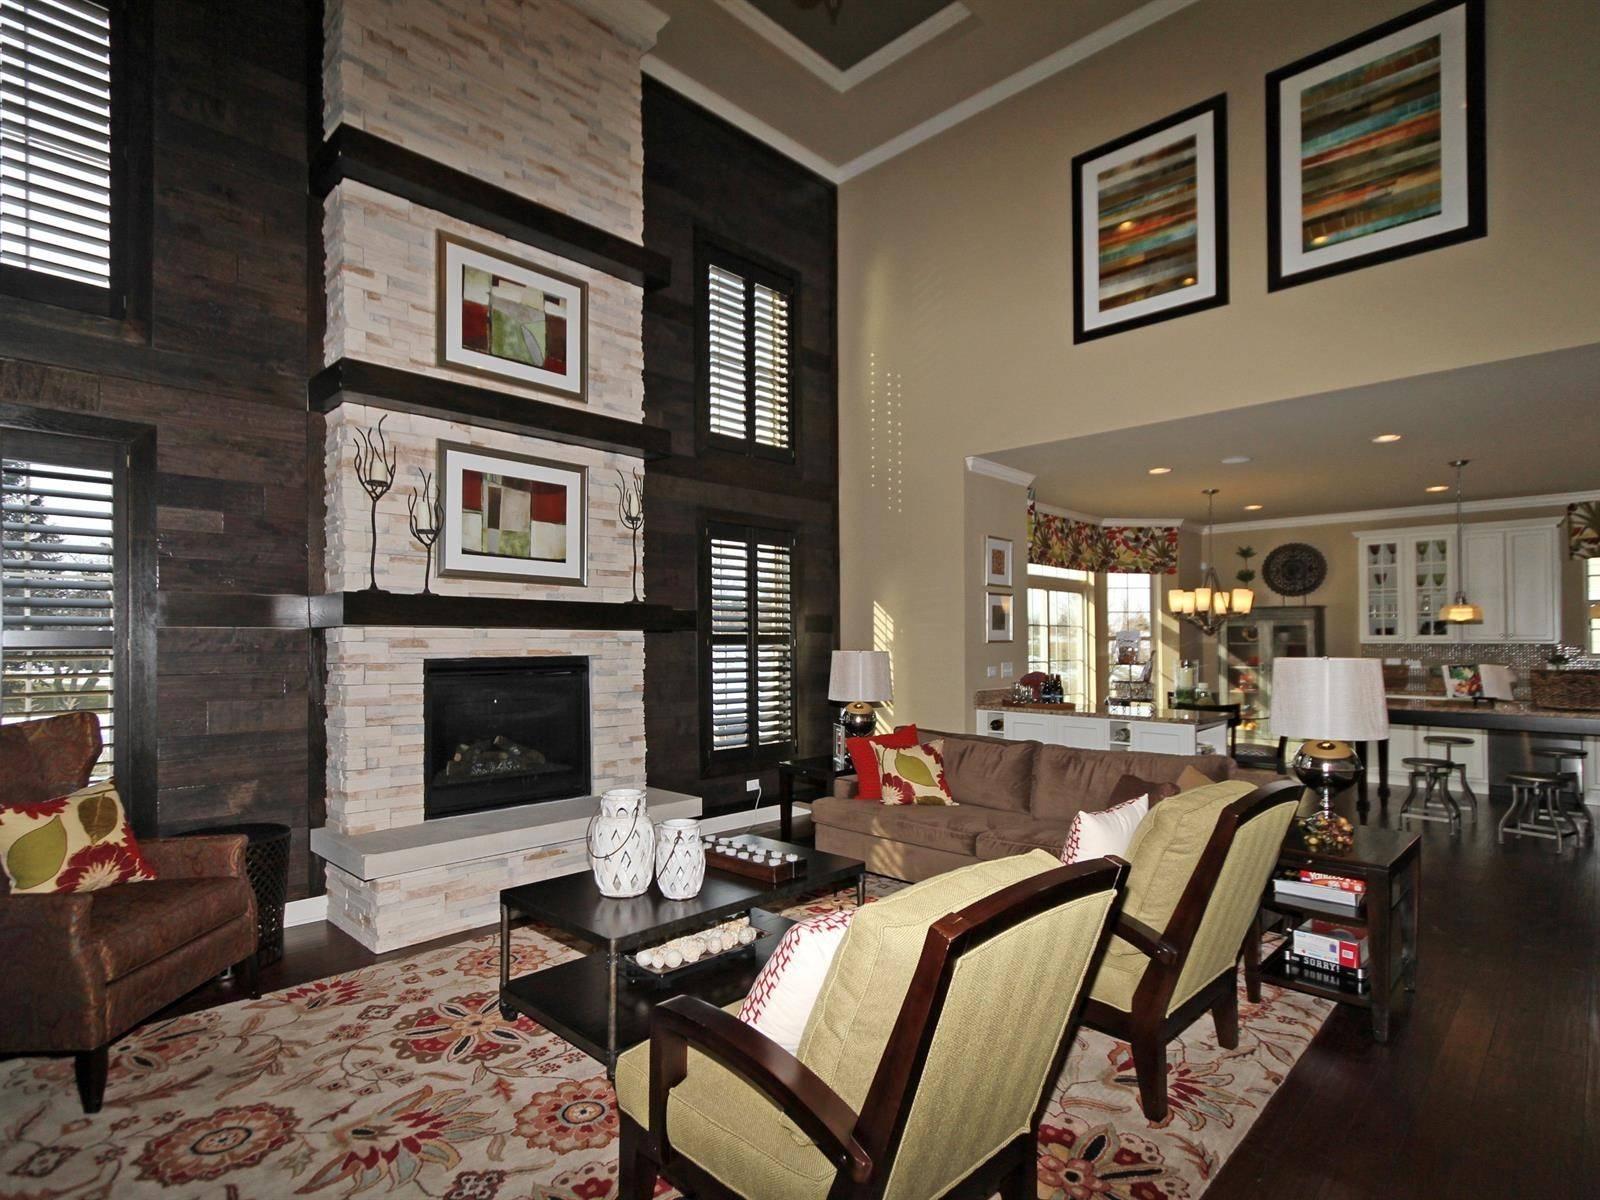 100 model homes interiors furniture modern apartment living room decorating ideas deck - Home decor courses model ...